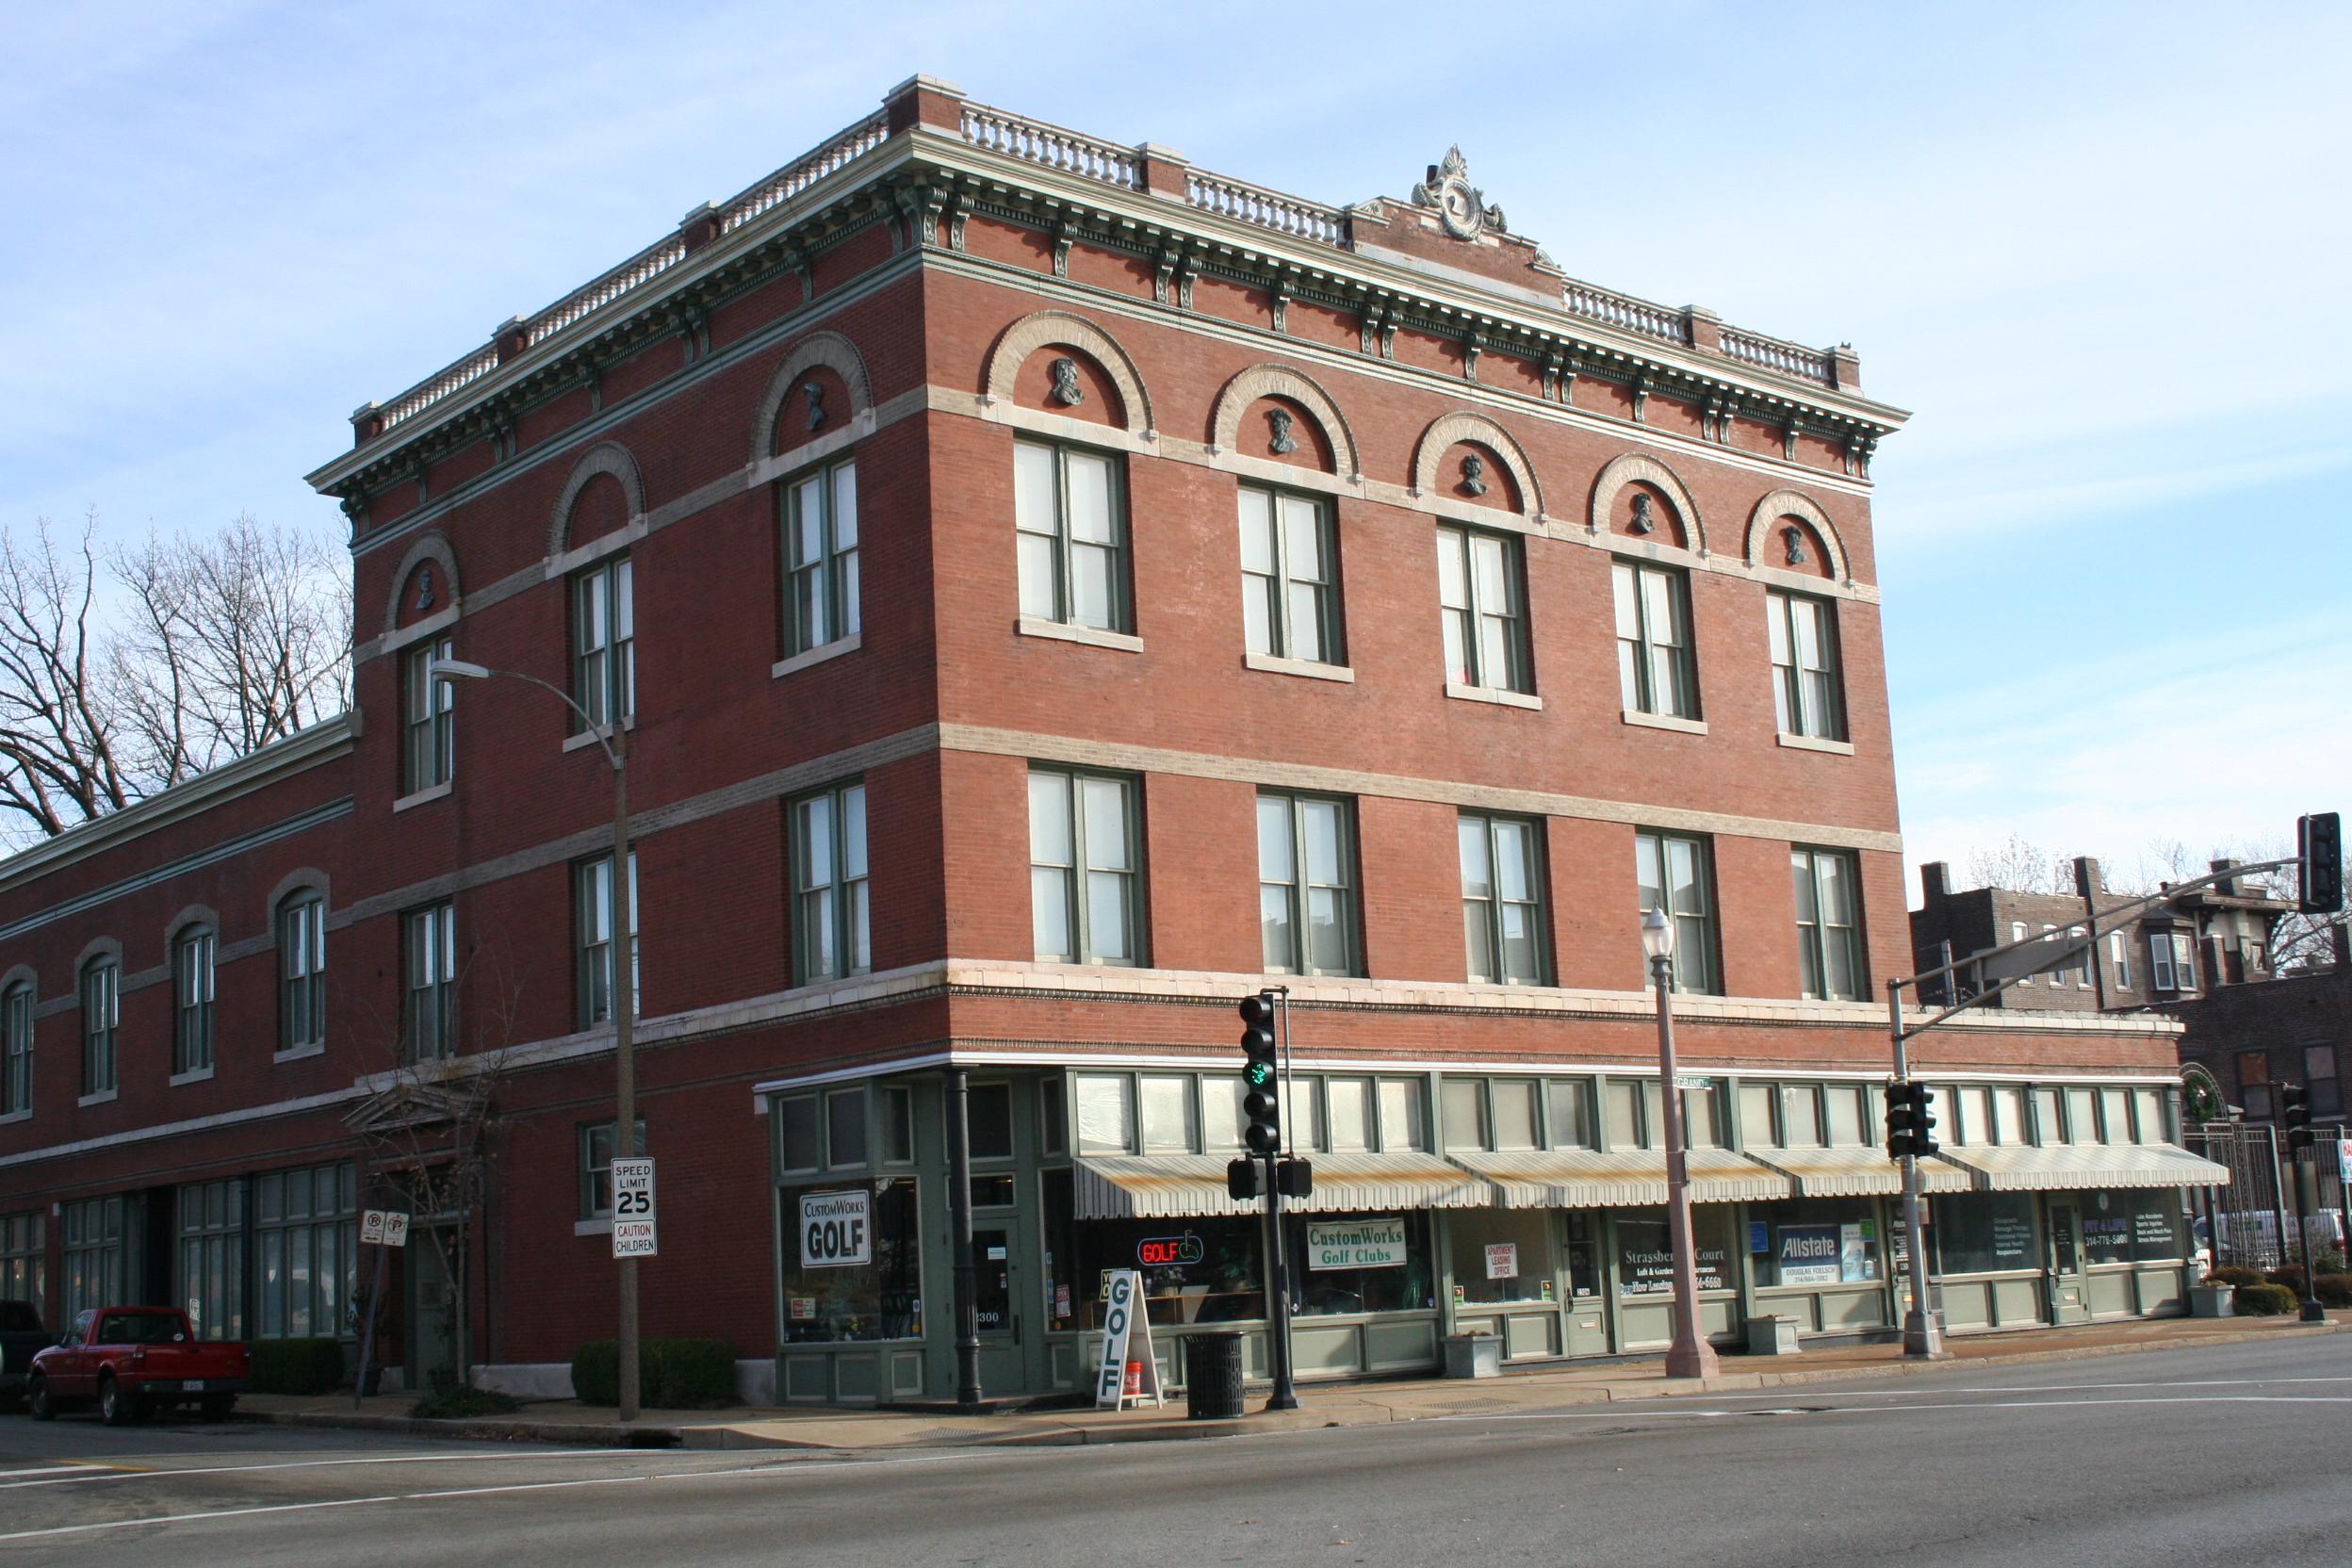 Old Strassberger Music Conservatory Building - City Landmark #83